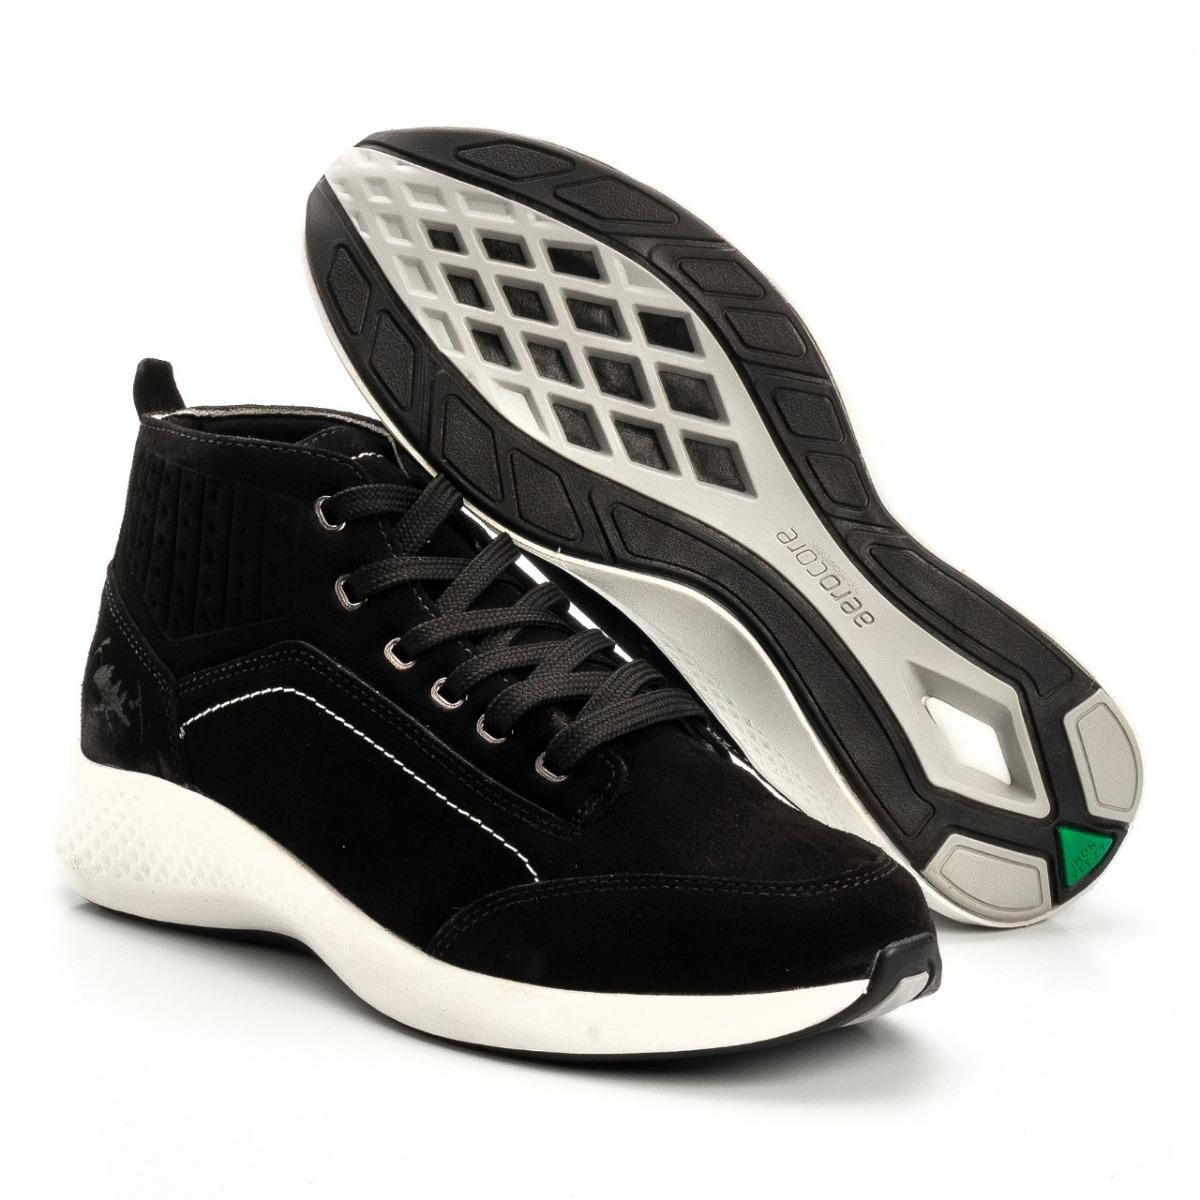 f9a8b3d0da1 Tenis Bota Max Leather Masculino Em Couro Legitimo Macio ! - R  149 ...